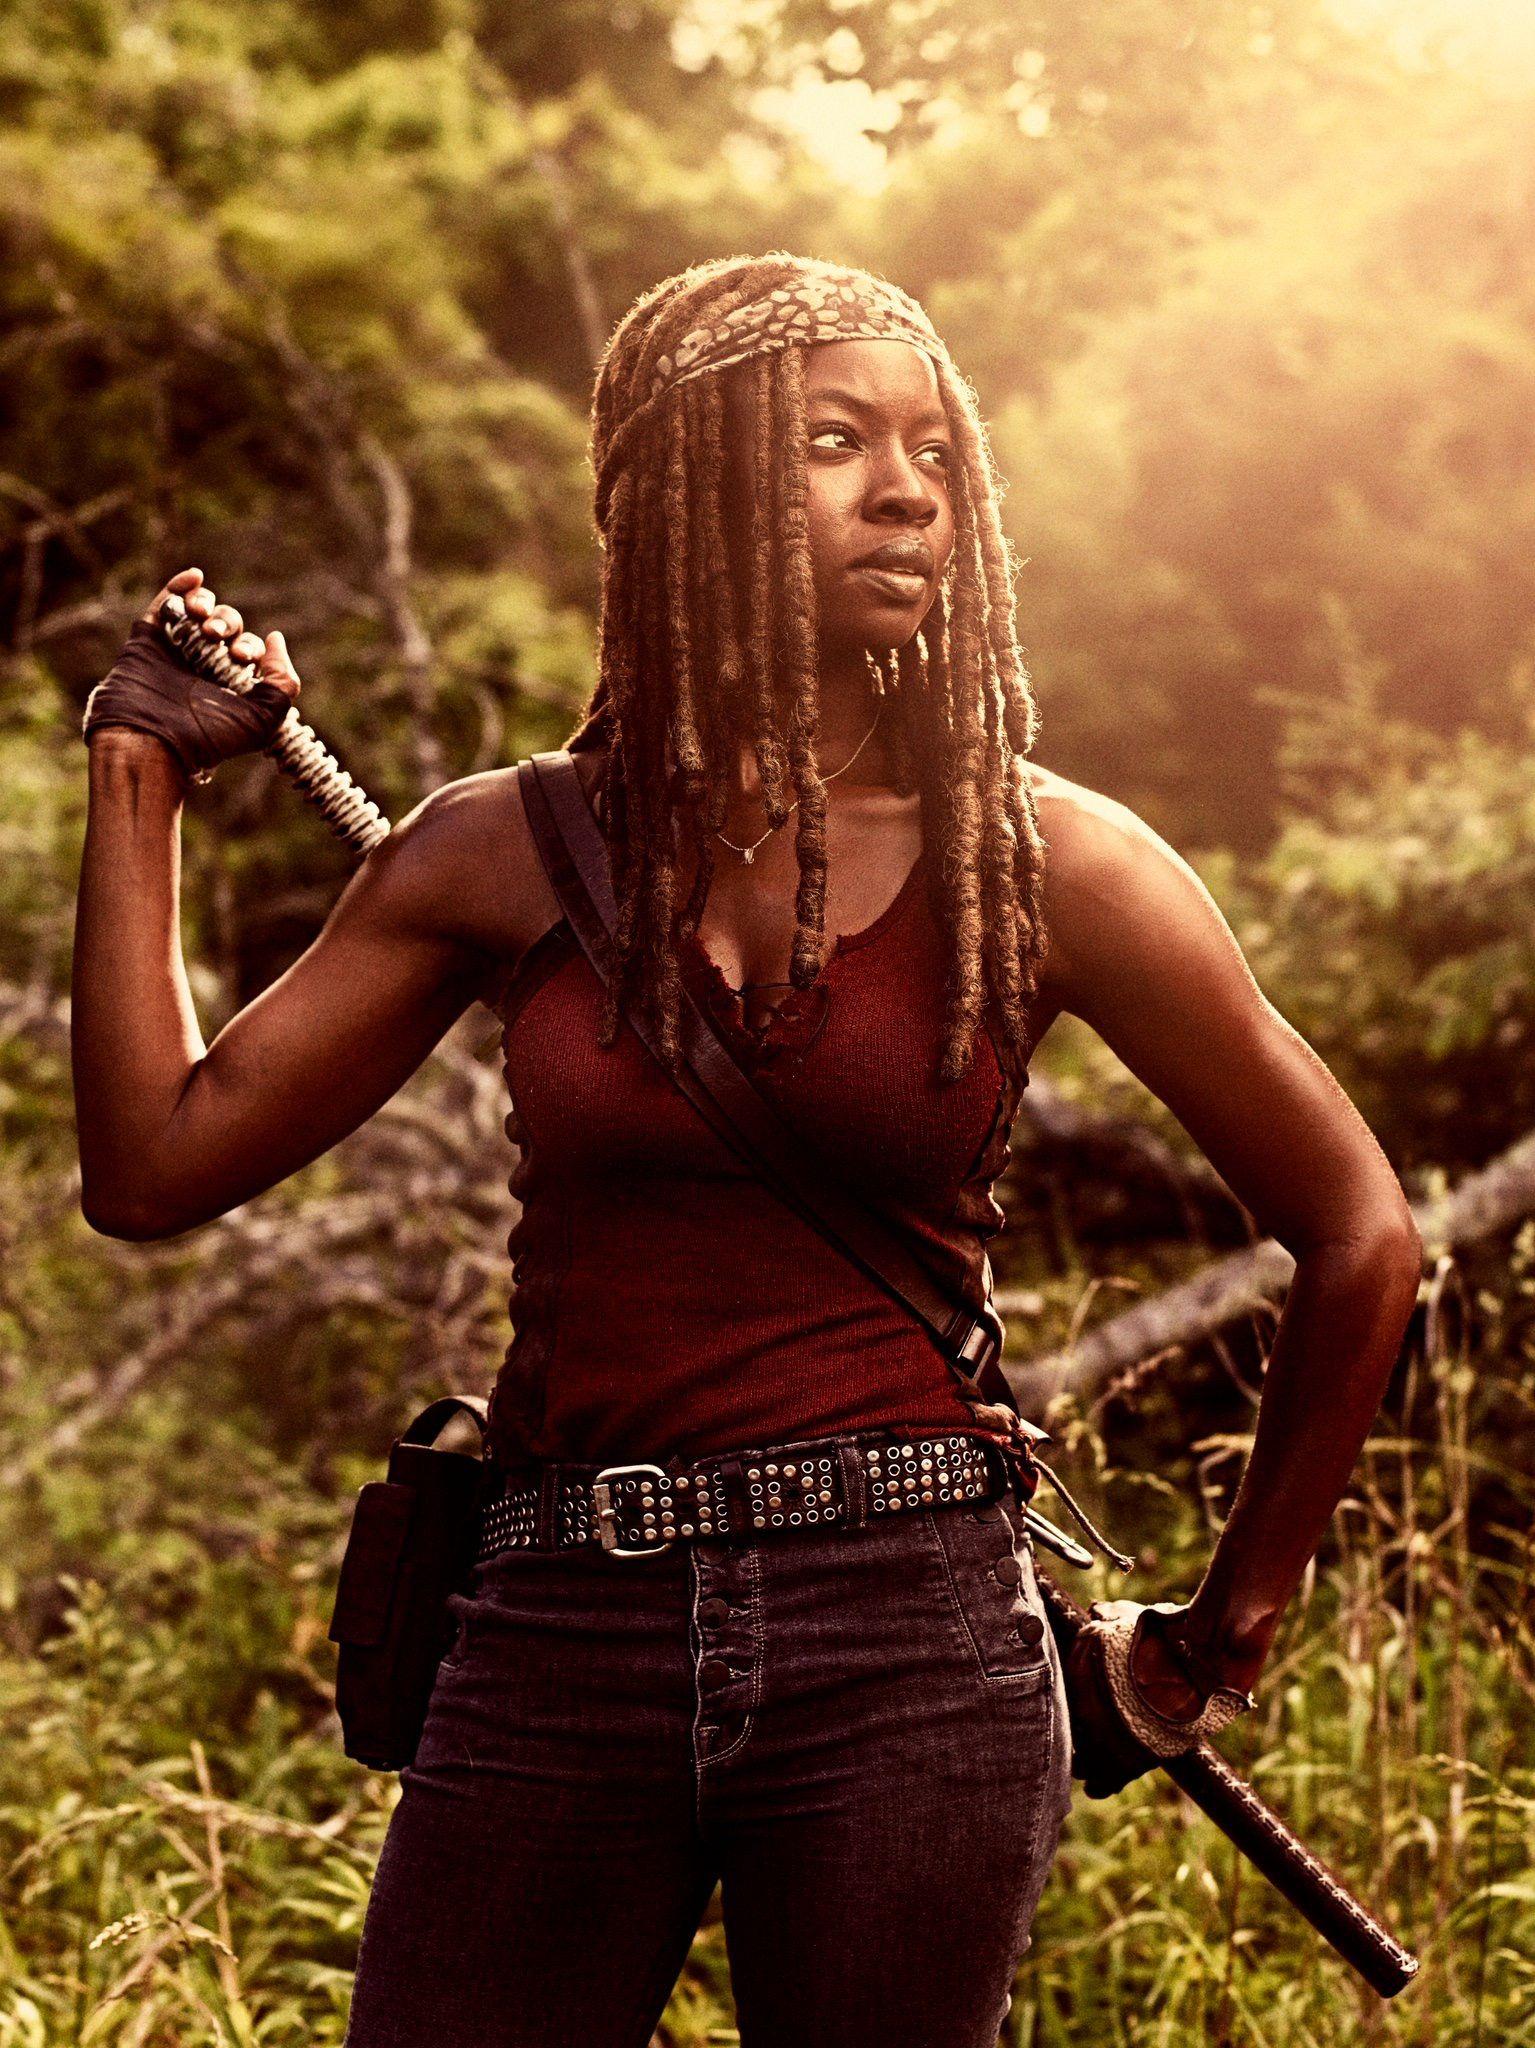 Happy Birthday! Danai Gurira aka Michonne from the walking dead.